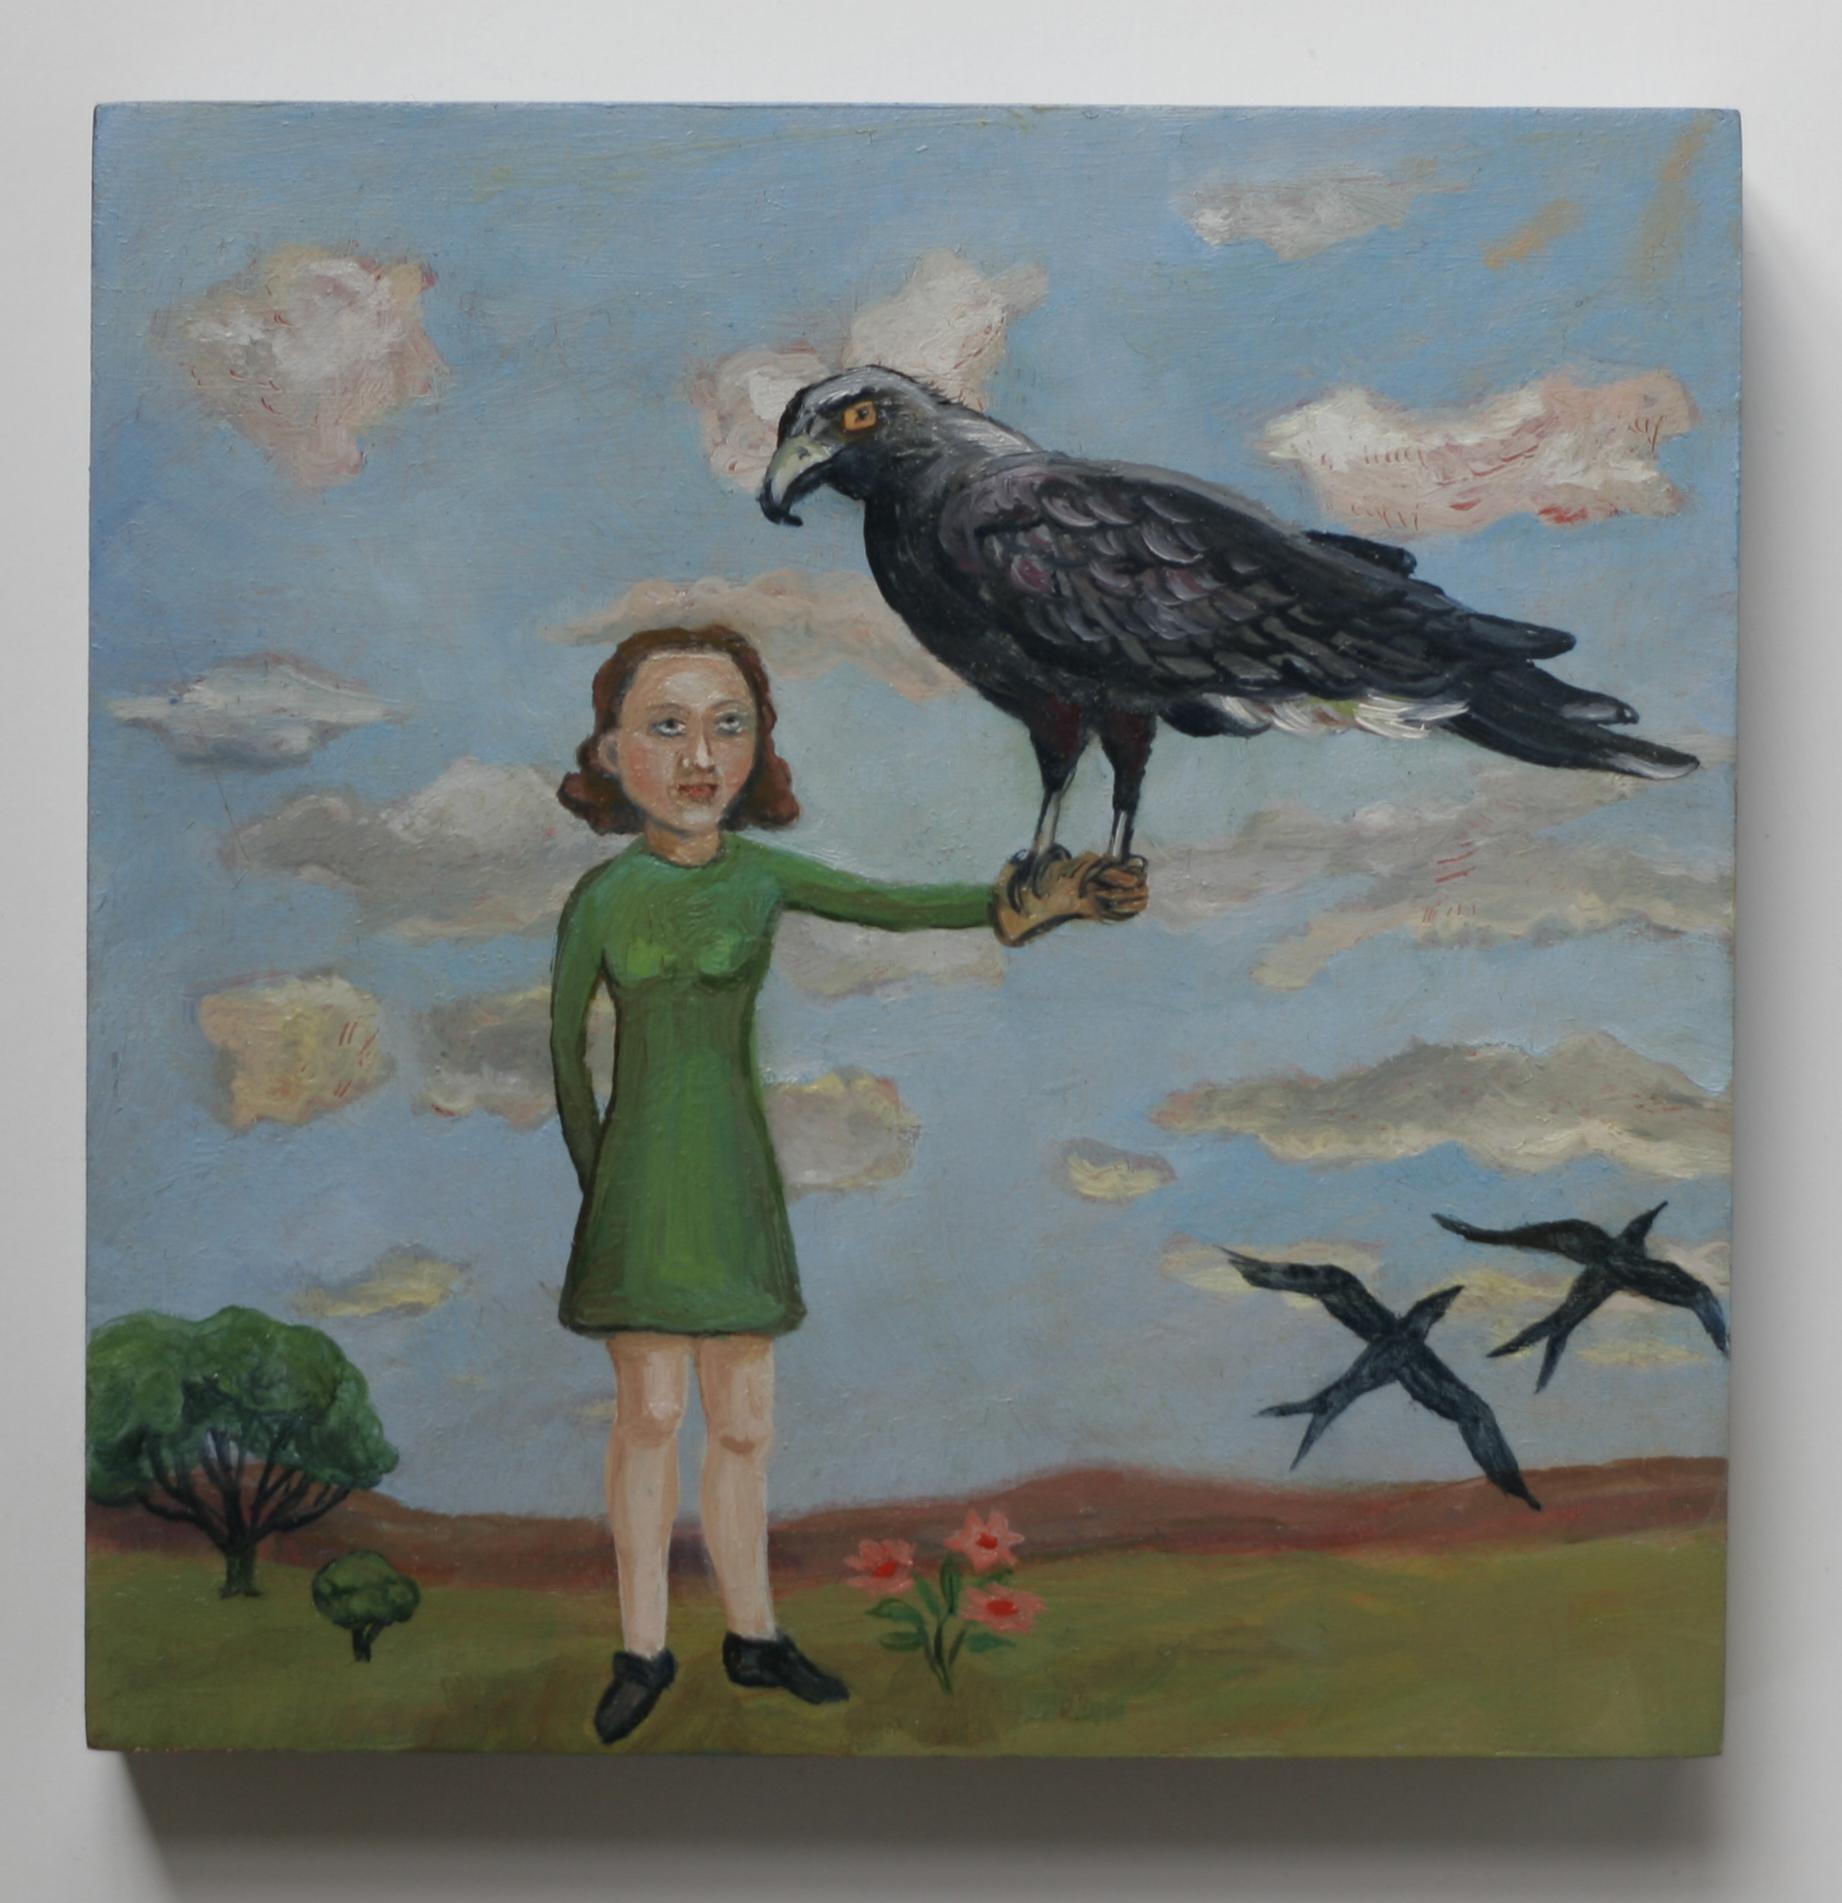 Girl with hawk2x3